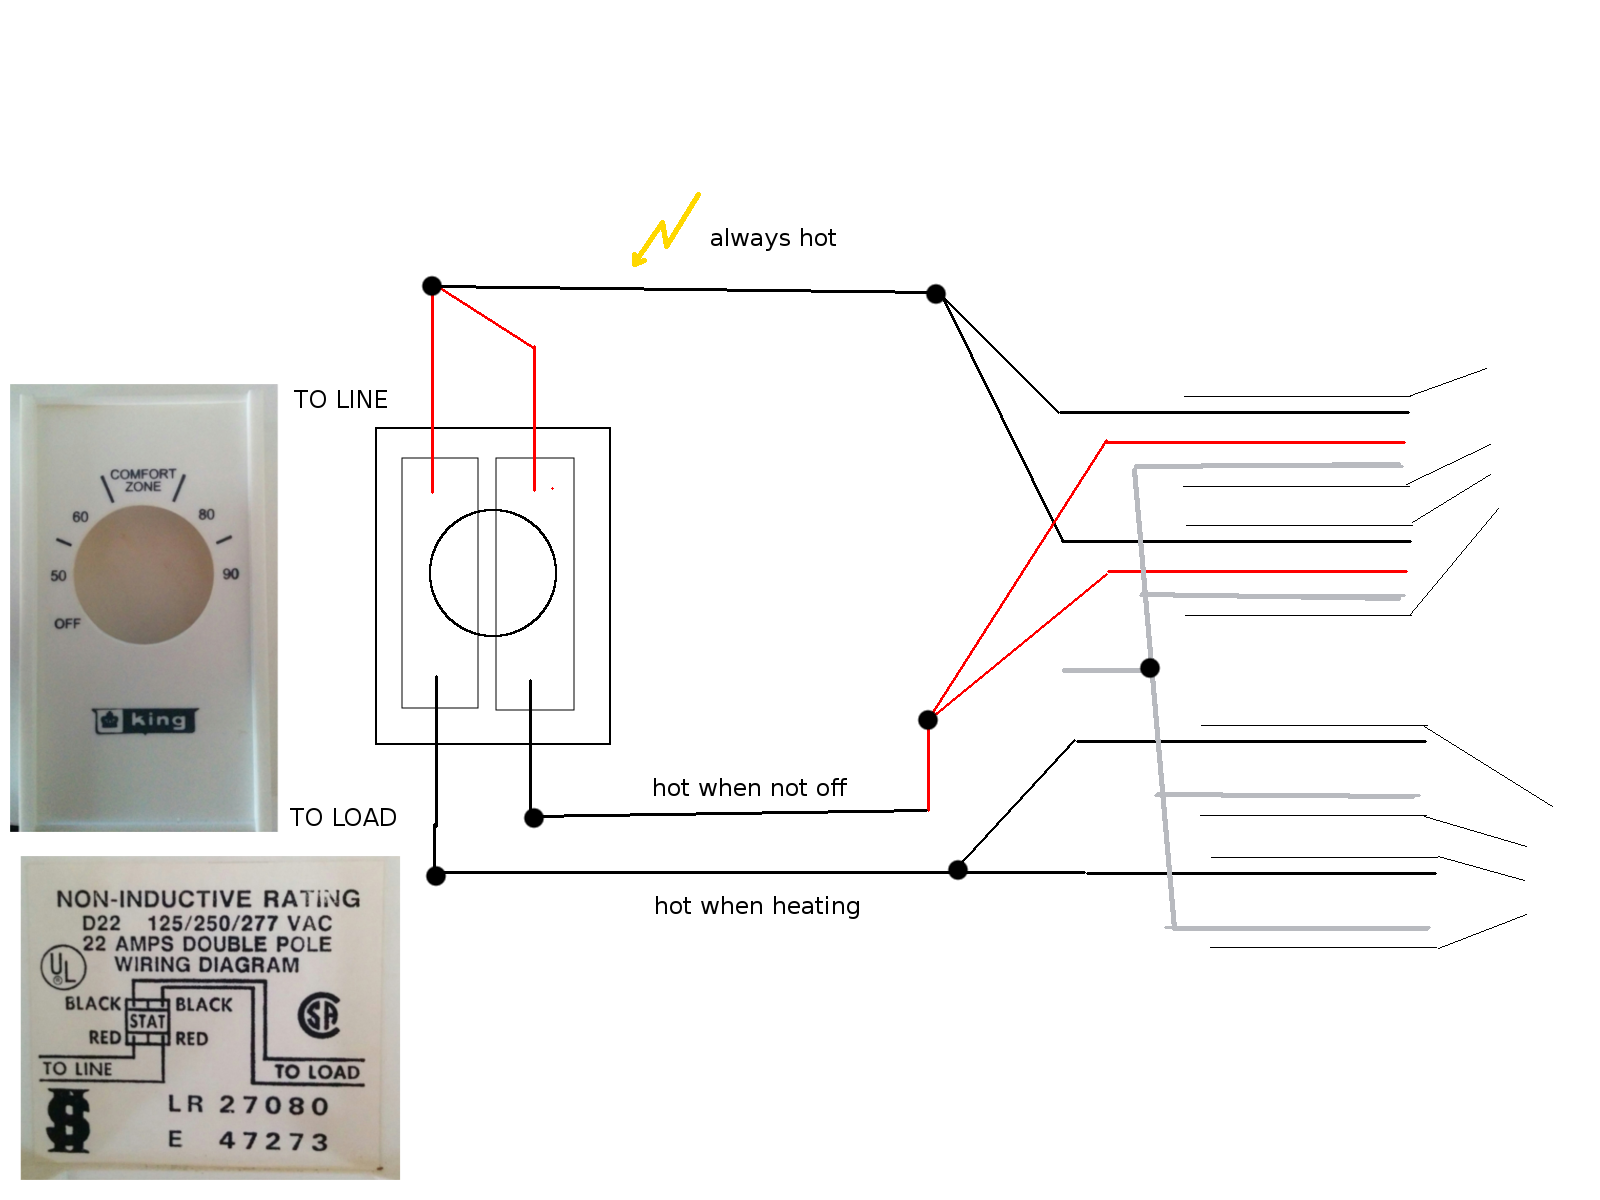 new wiring diagram load meaning diagram diagramsample diagramtemplate [ 1600 x 1200 Pixel ]